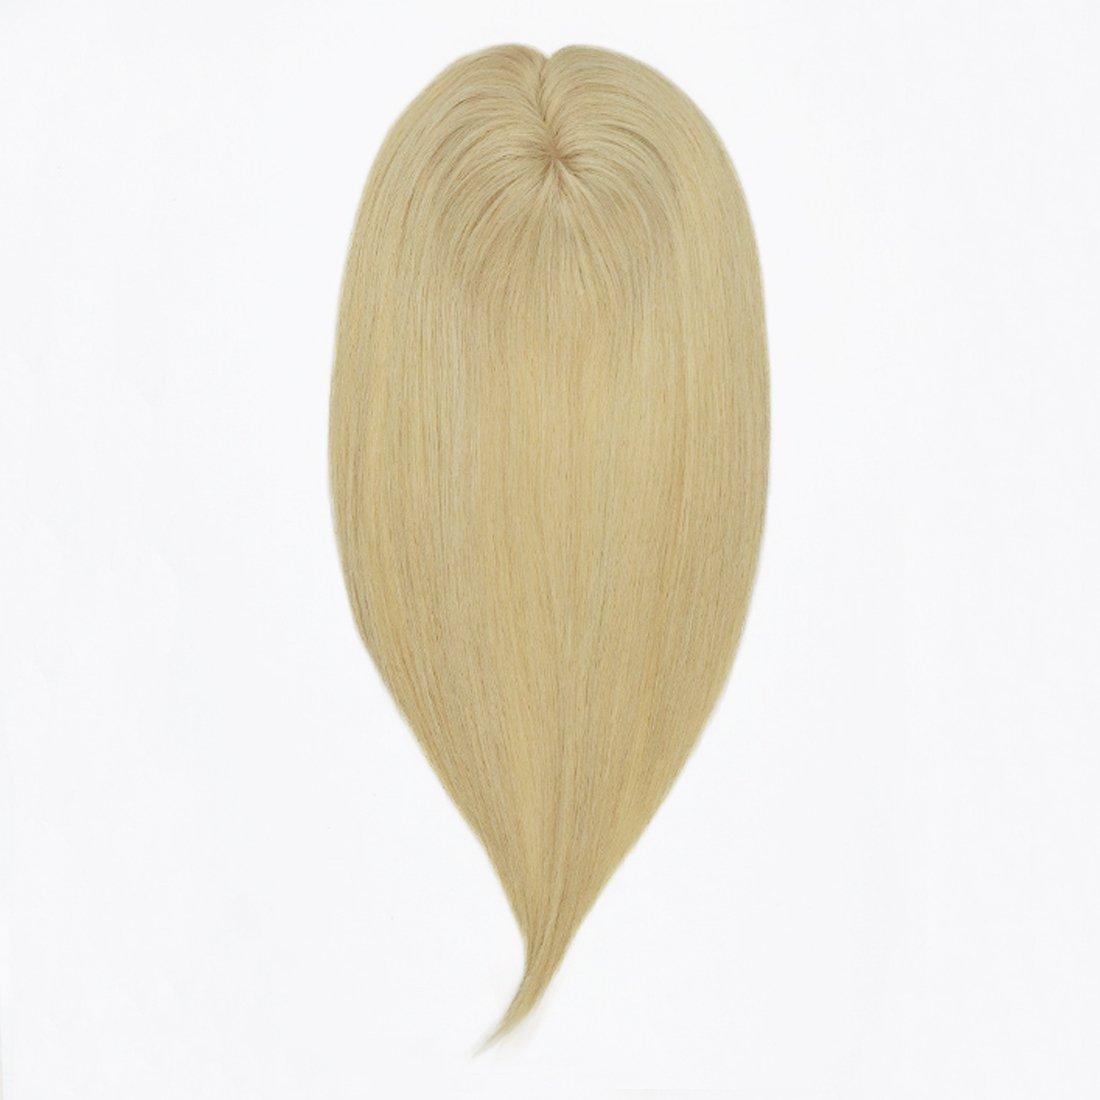 UniWigs Amber Silk Top Virgin Remy Human Hair Topper Pieces, Easy Volume For Hair Loss or Thin Hair (18'', 613#)